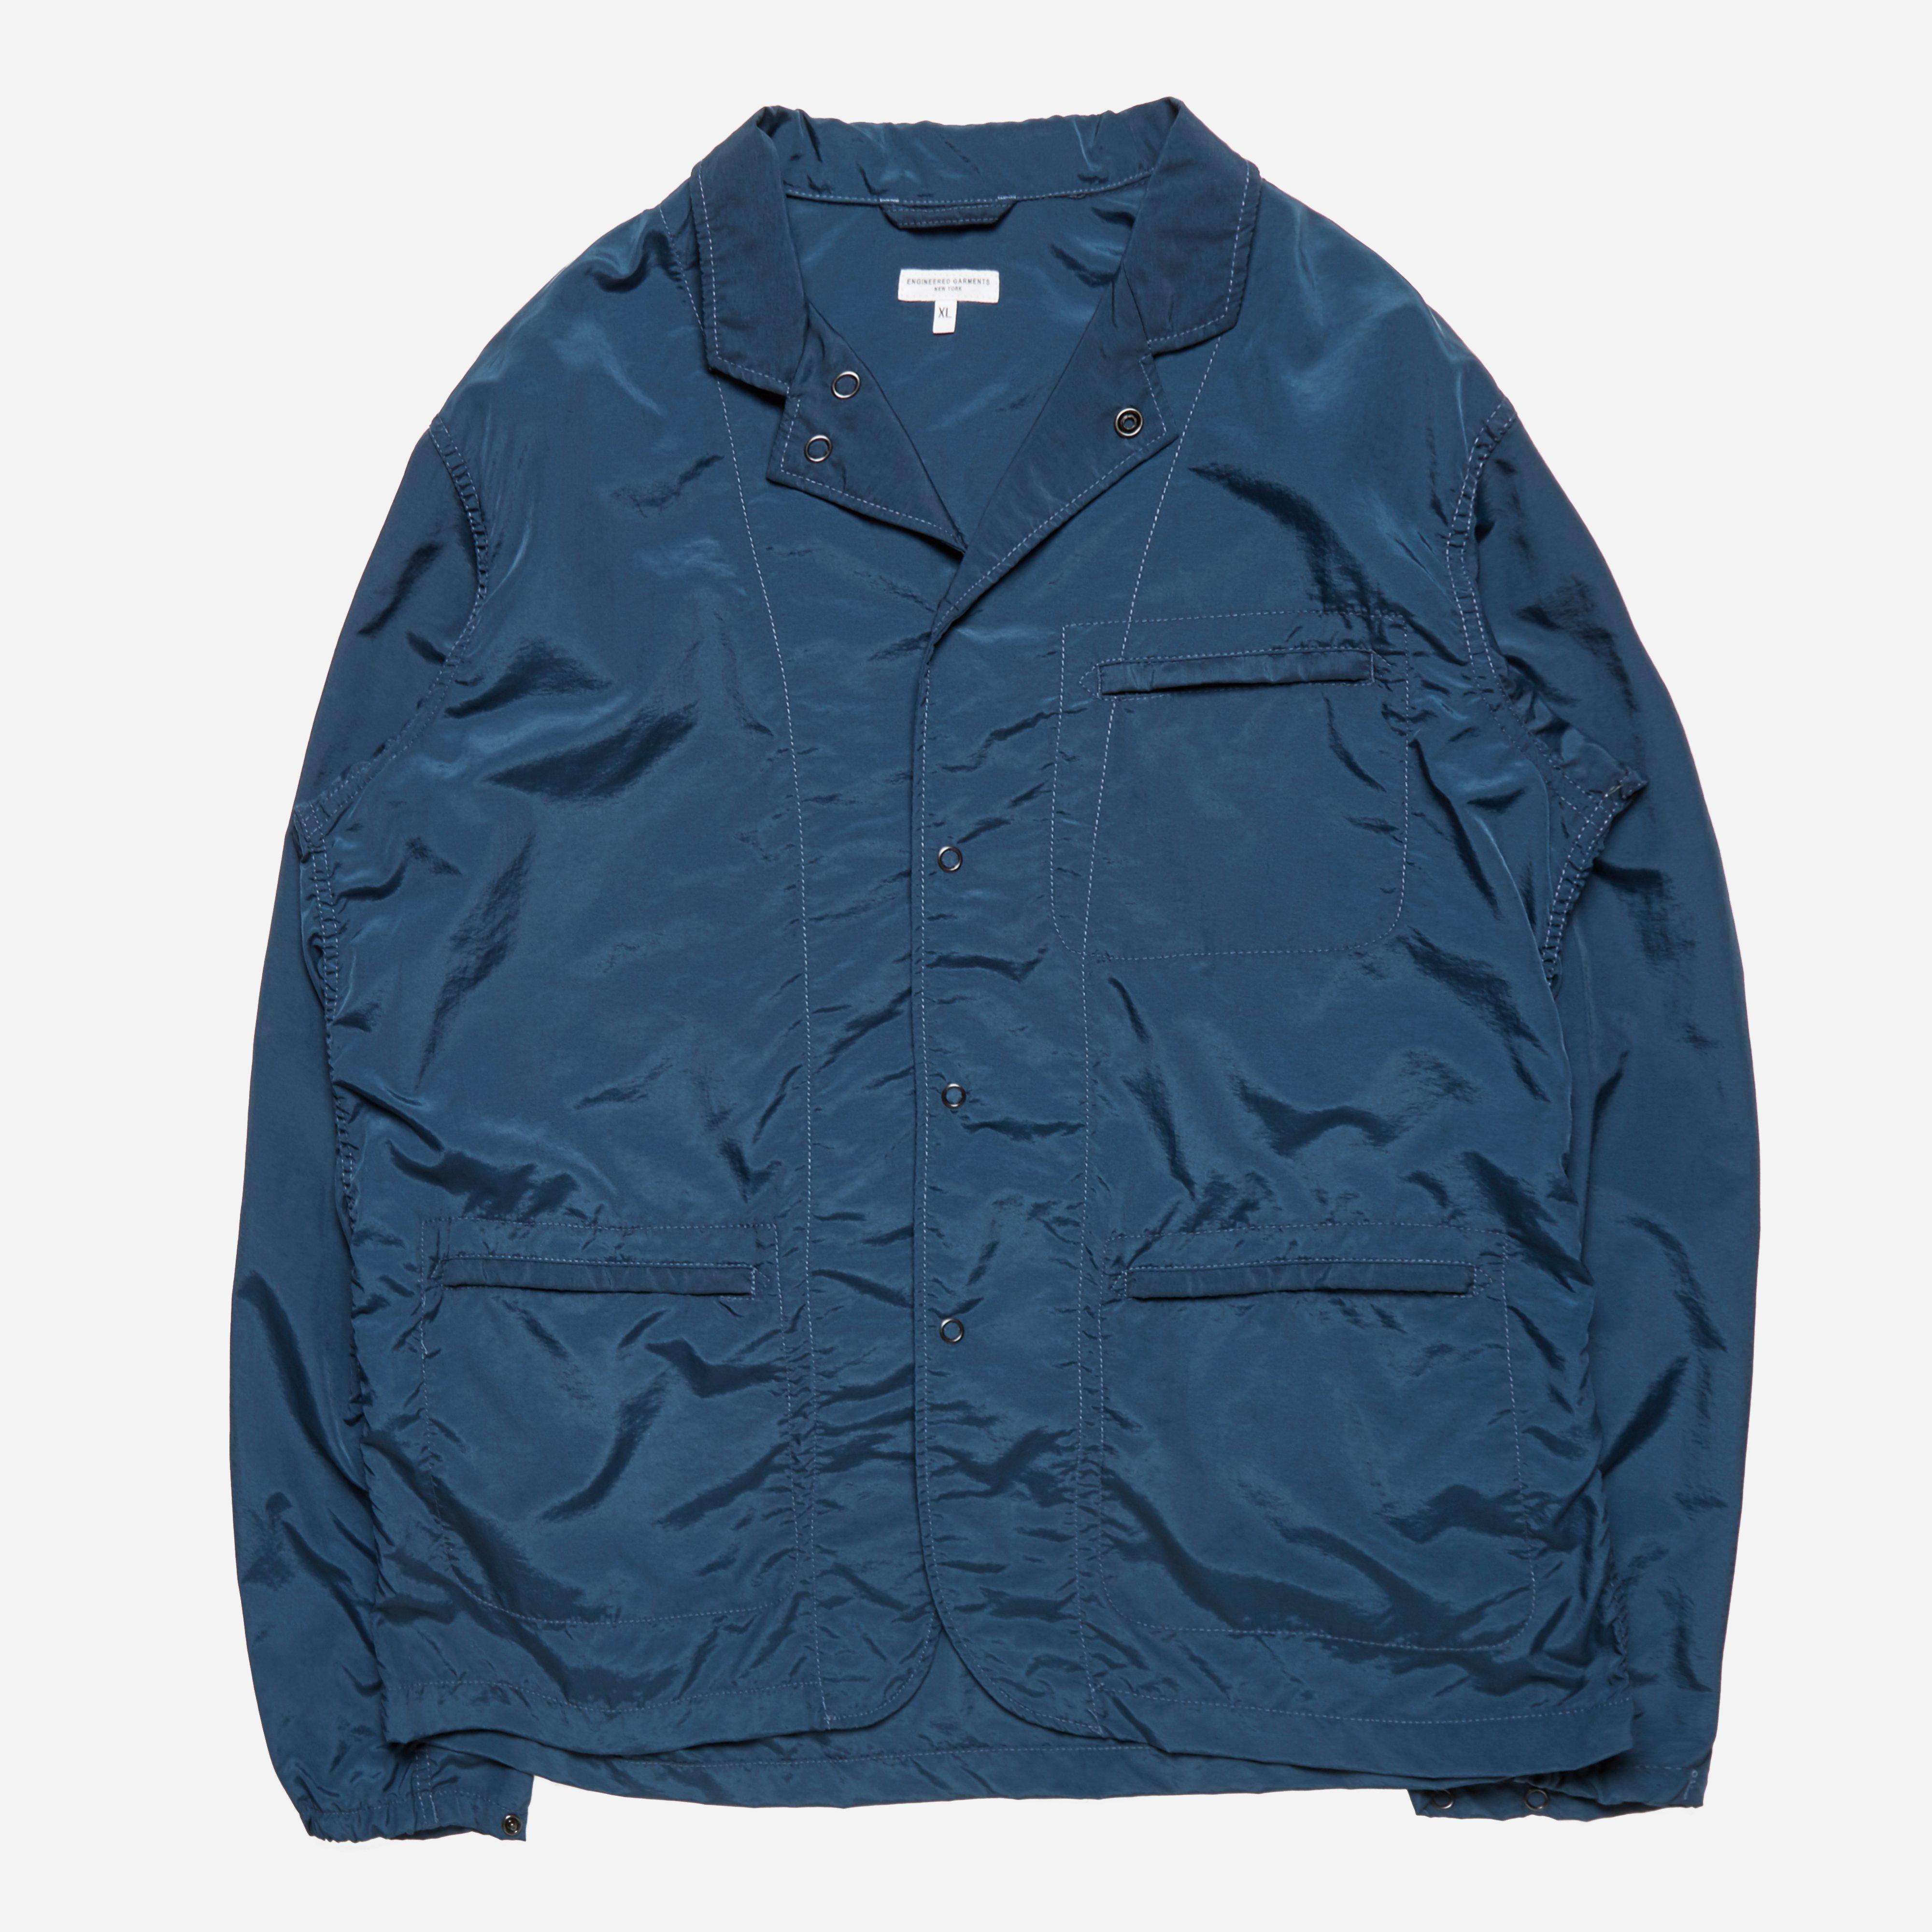 Engineered Garments Knockabout Jacket Taslan Nylon